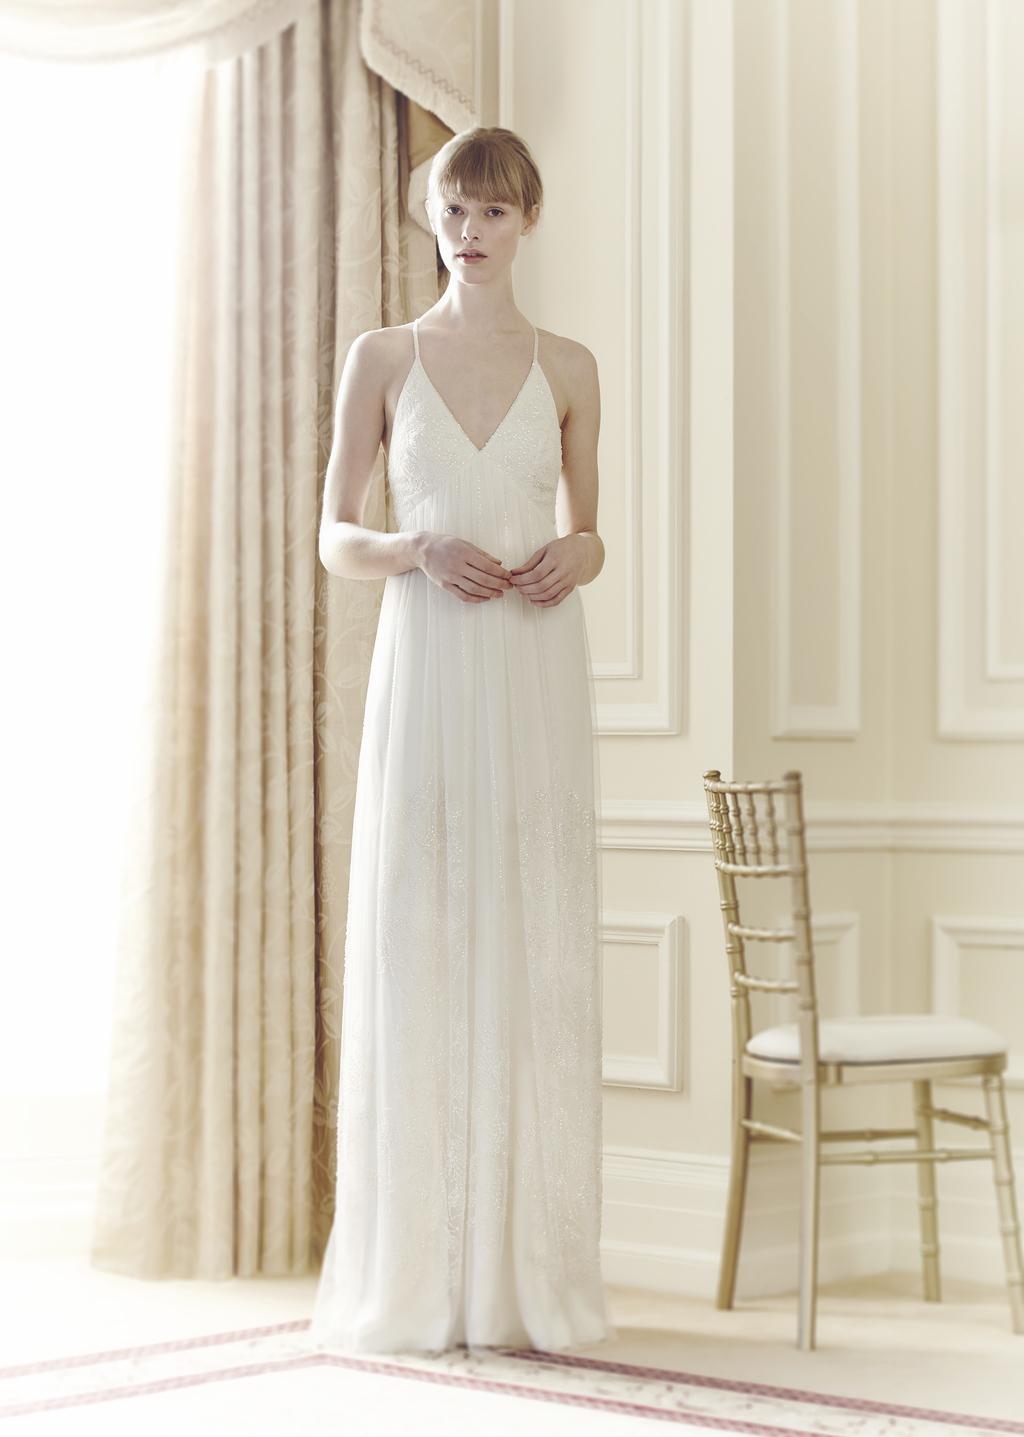 Jenny-packham-bridal-collection-spring-summer-2014-summer2.full